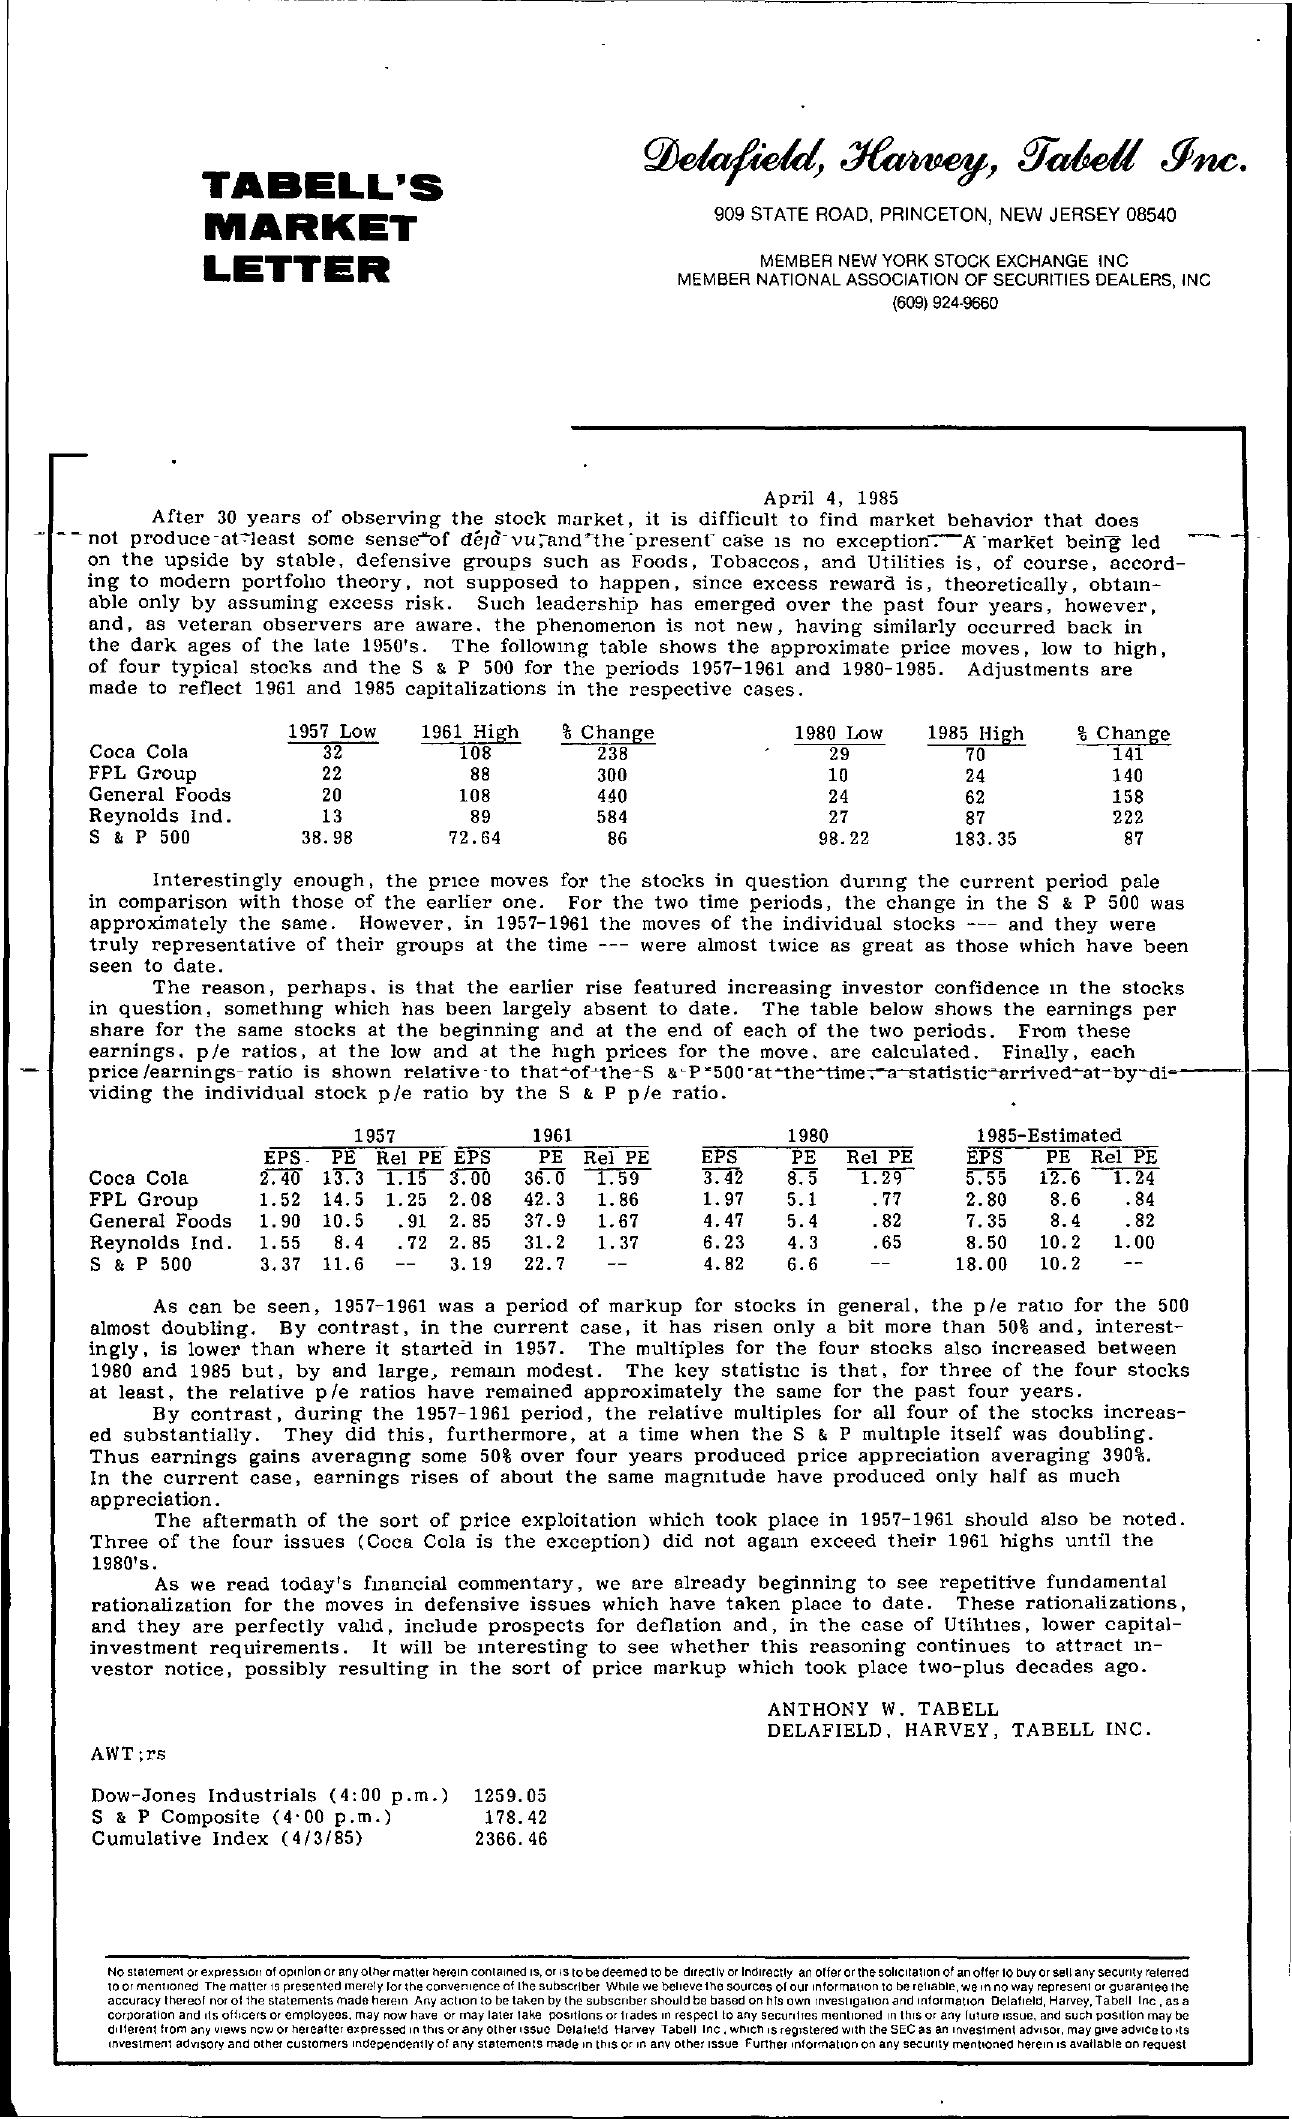 Tabell's Market Letter - April 04, 1985